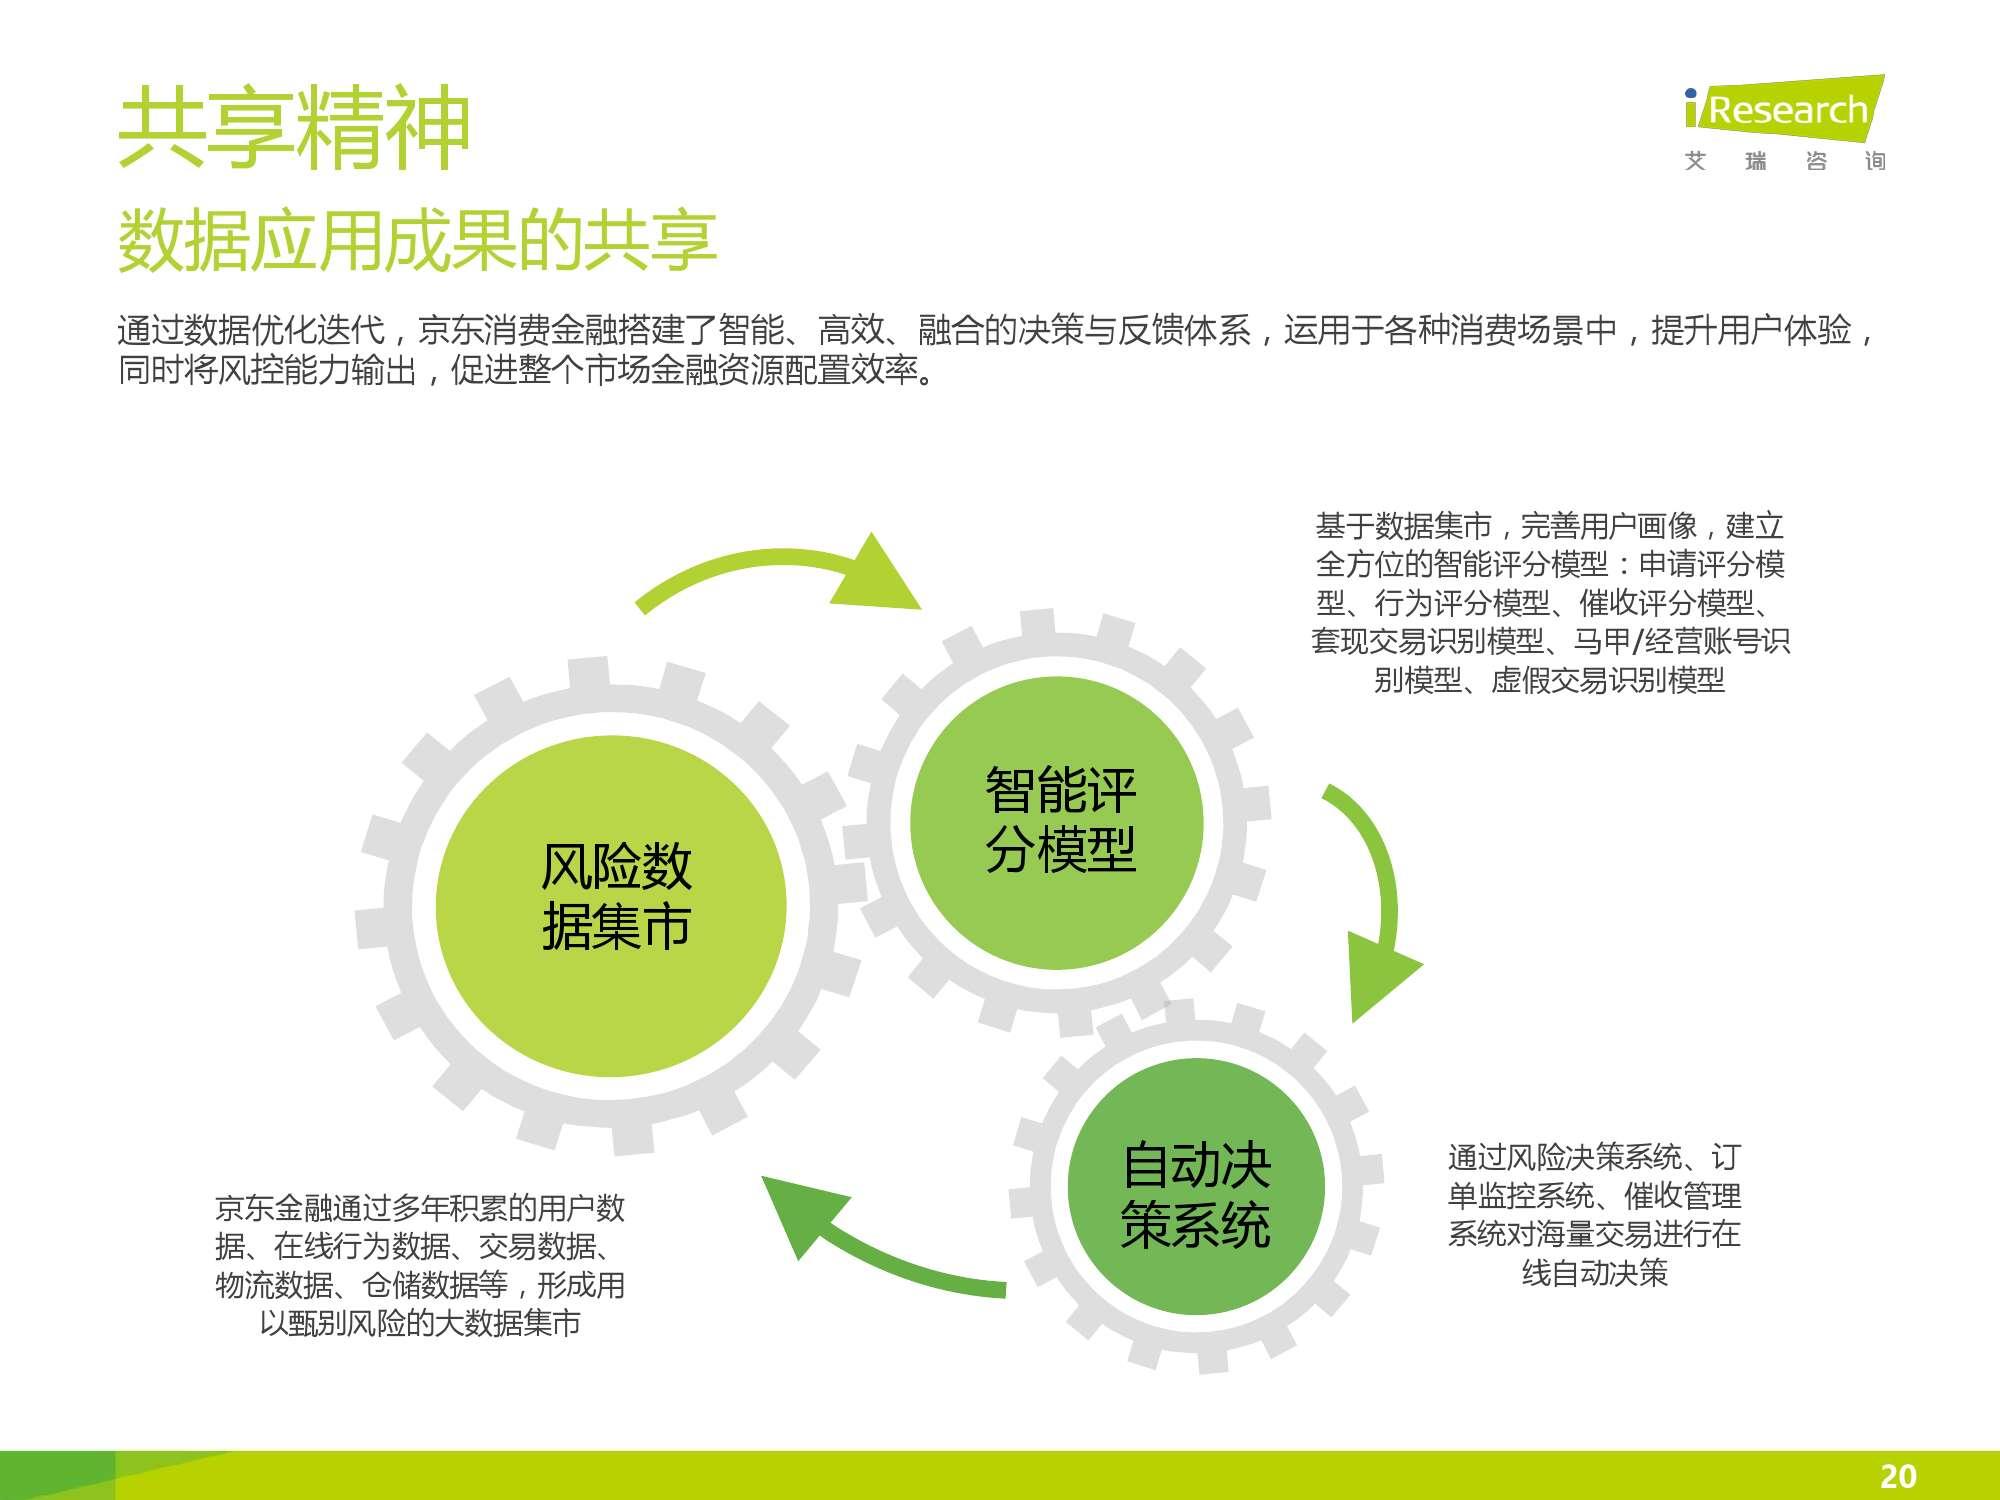 iResearch-2016年中国互联网消费金融市场研究报告_000020